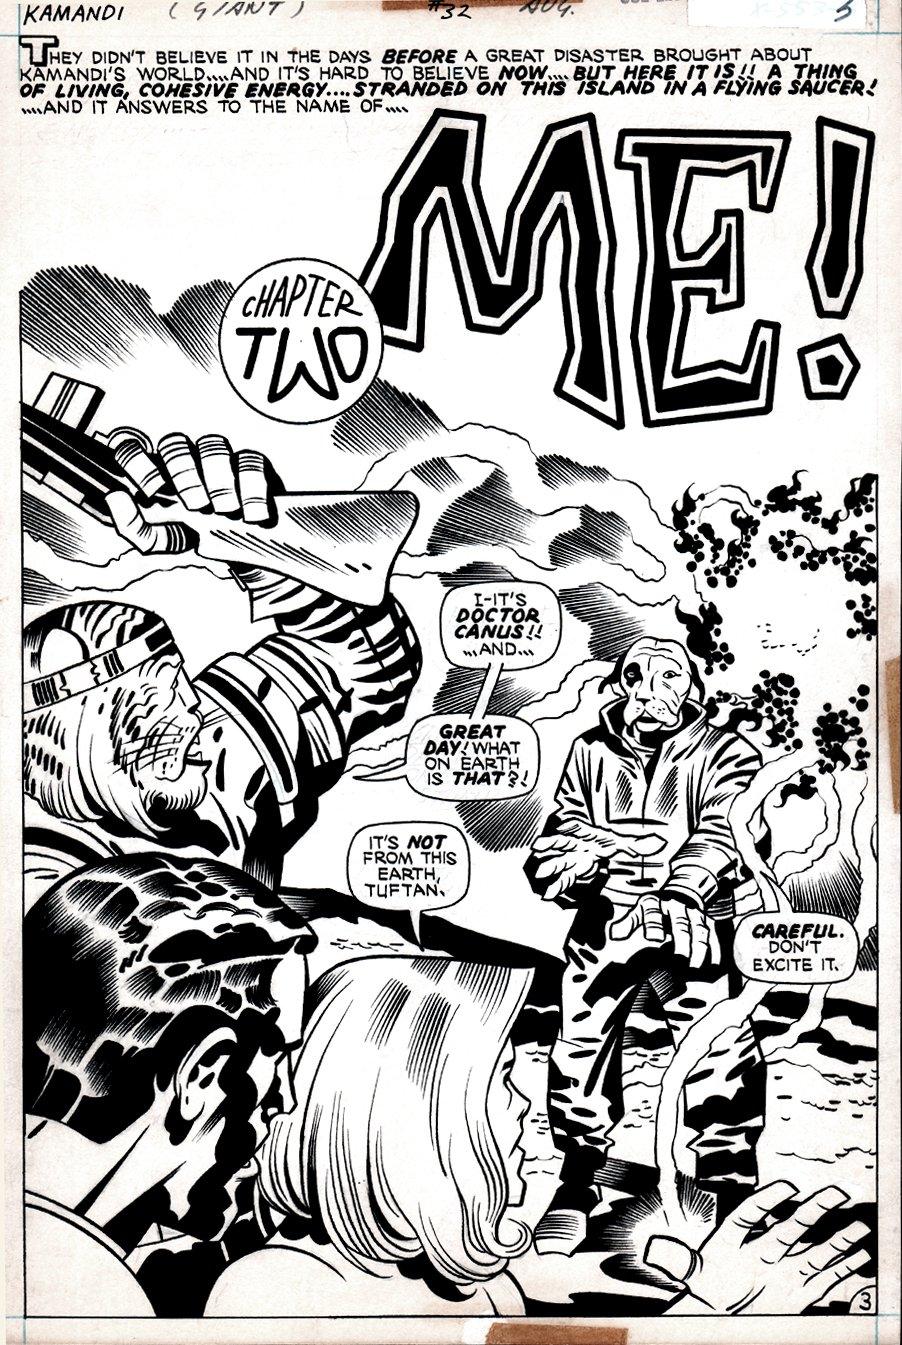 Kamandi #32 p 3  SPLASH (KAMANDI, DR. CANUS, BEN BOXER, THE BEASTMEN!) 1975